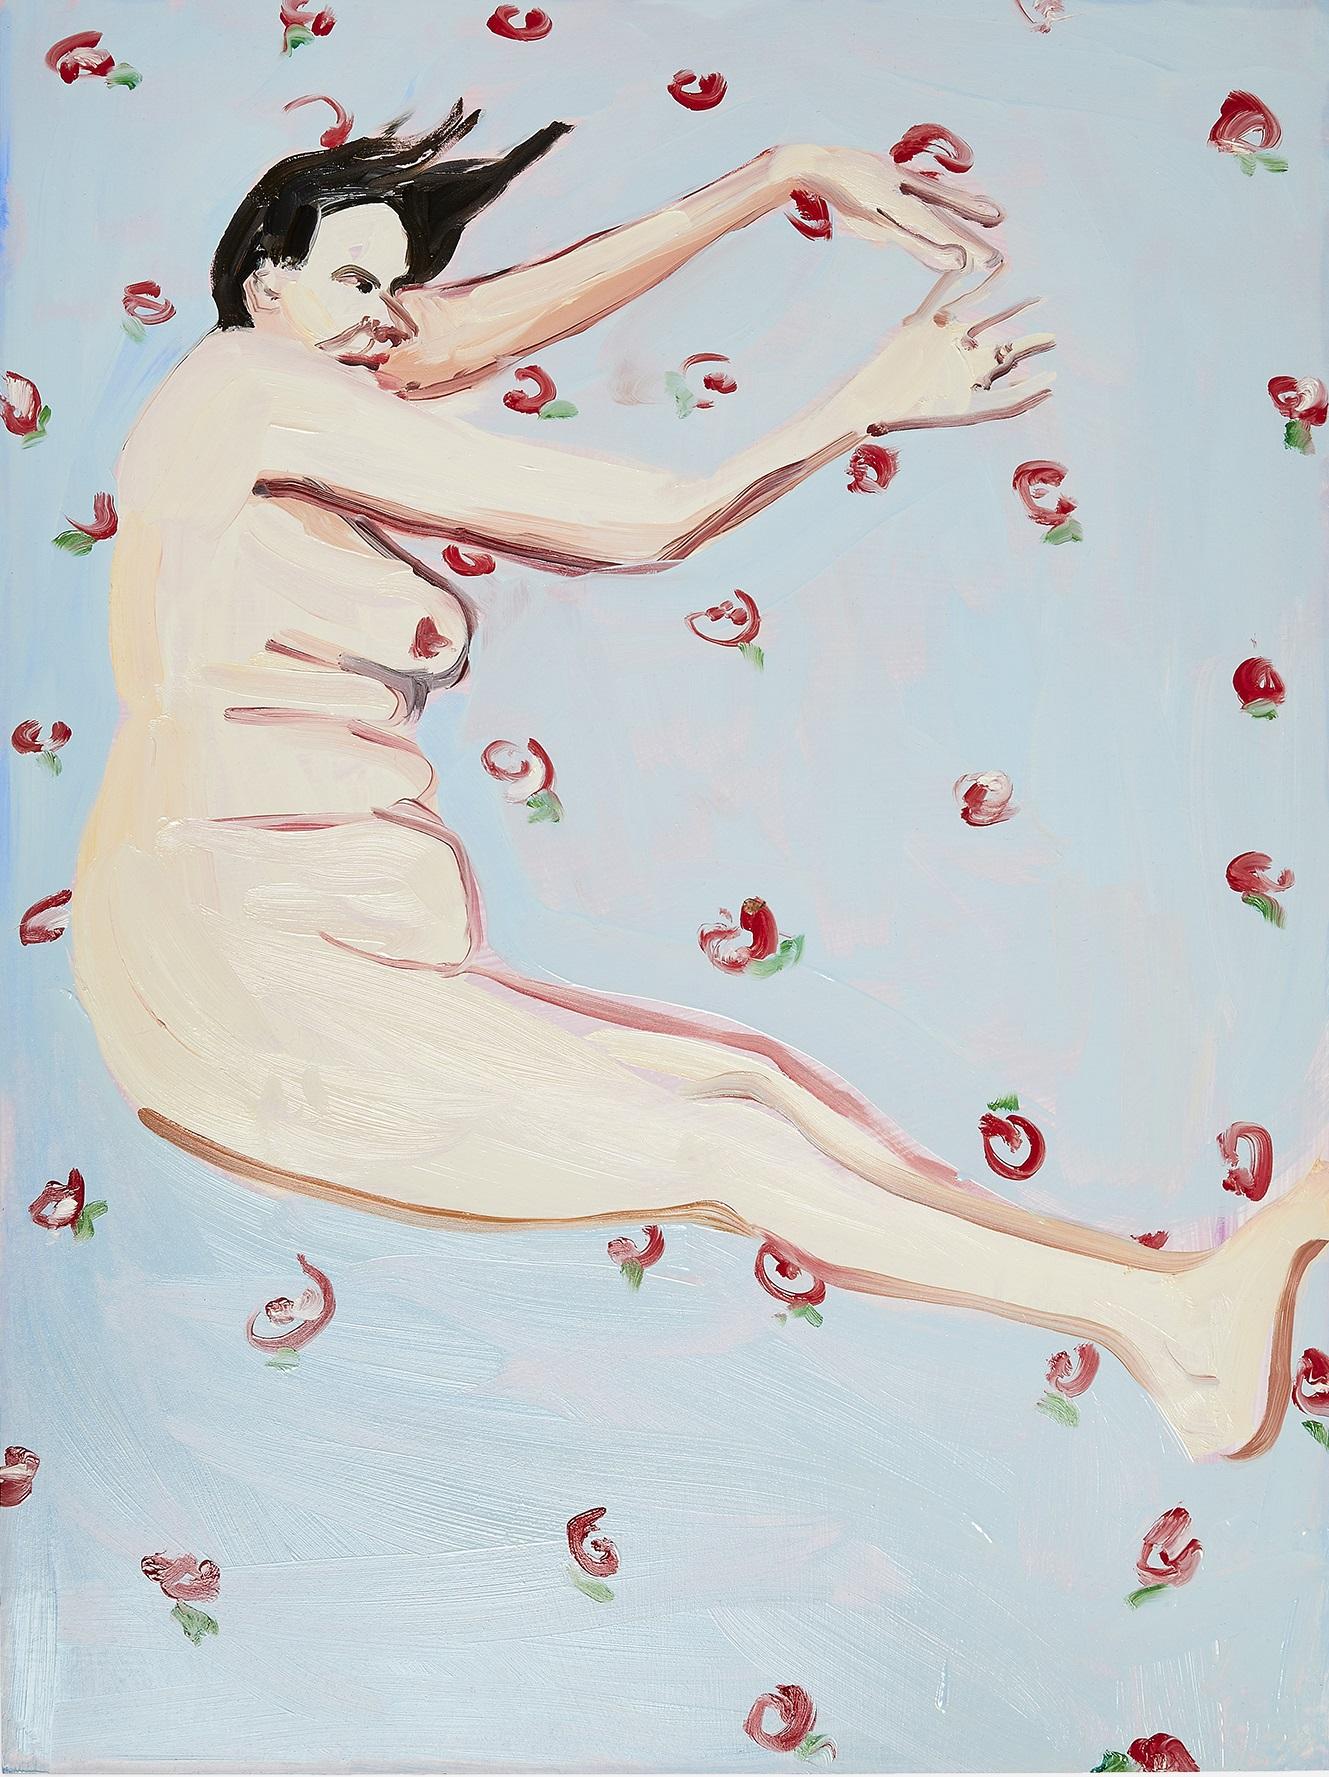 C - Conscious - Chantal Joffe.jpg